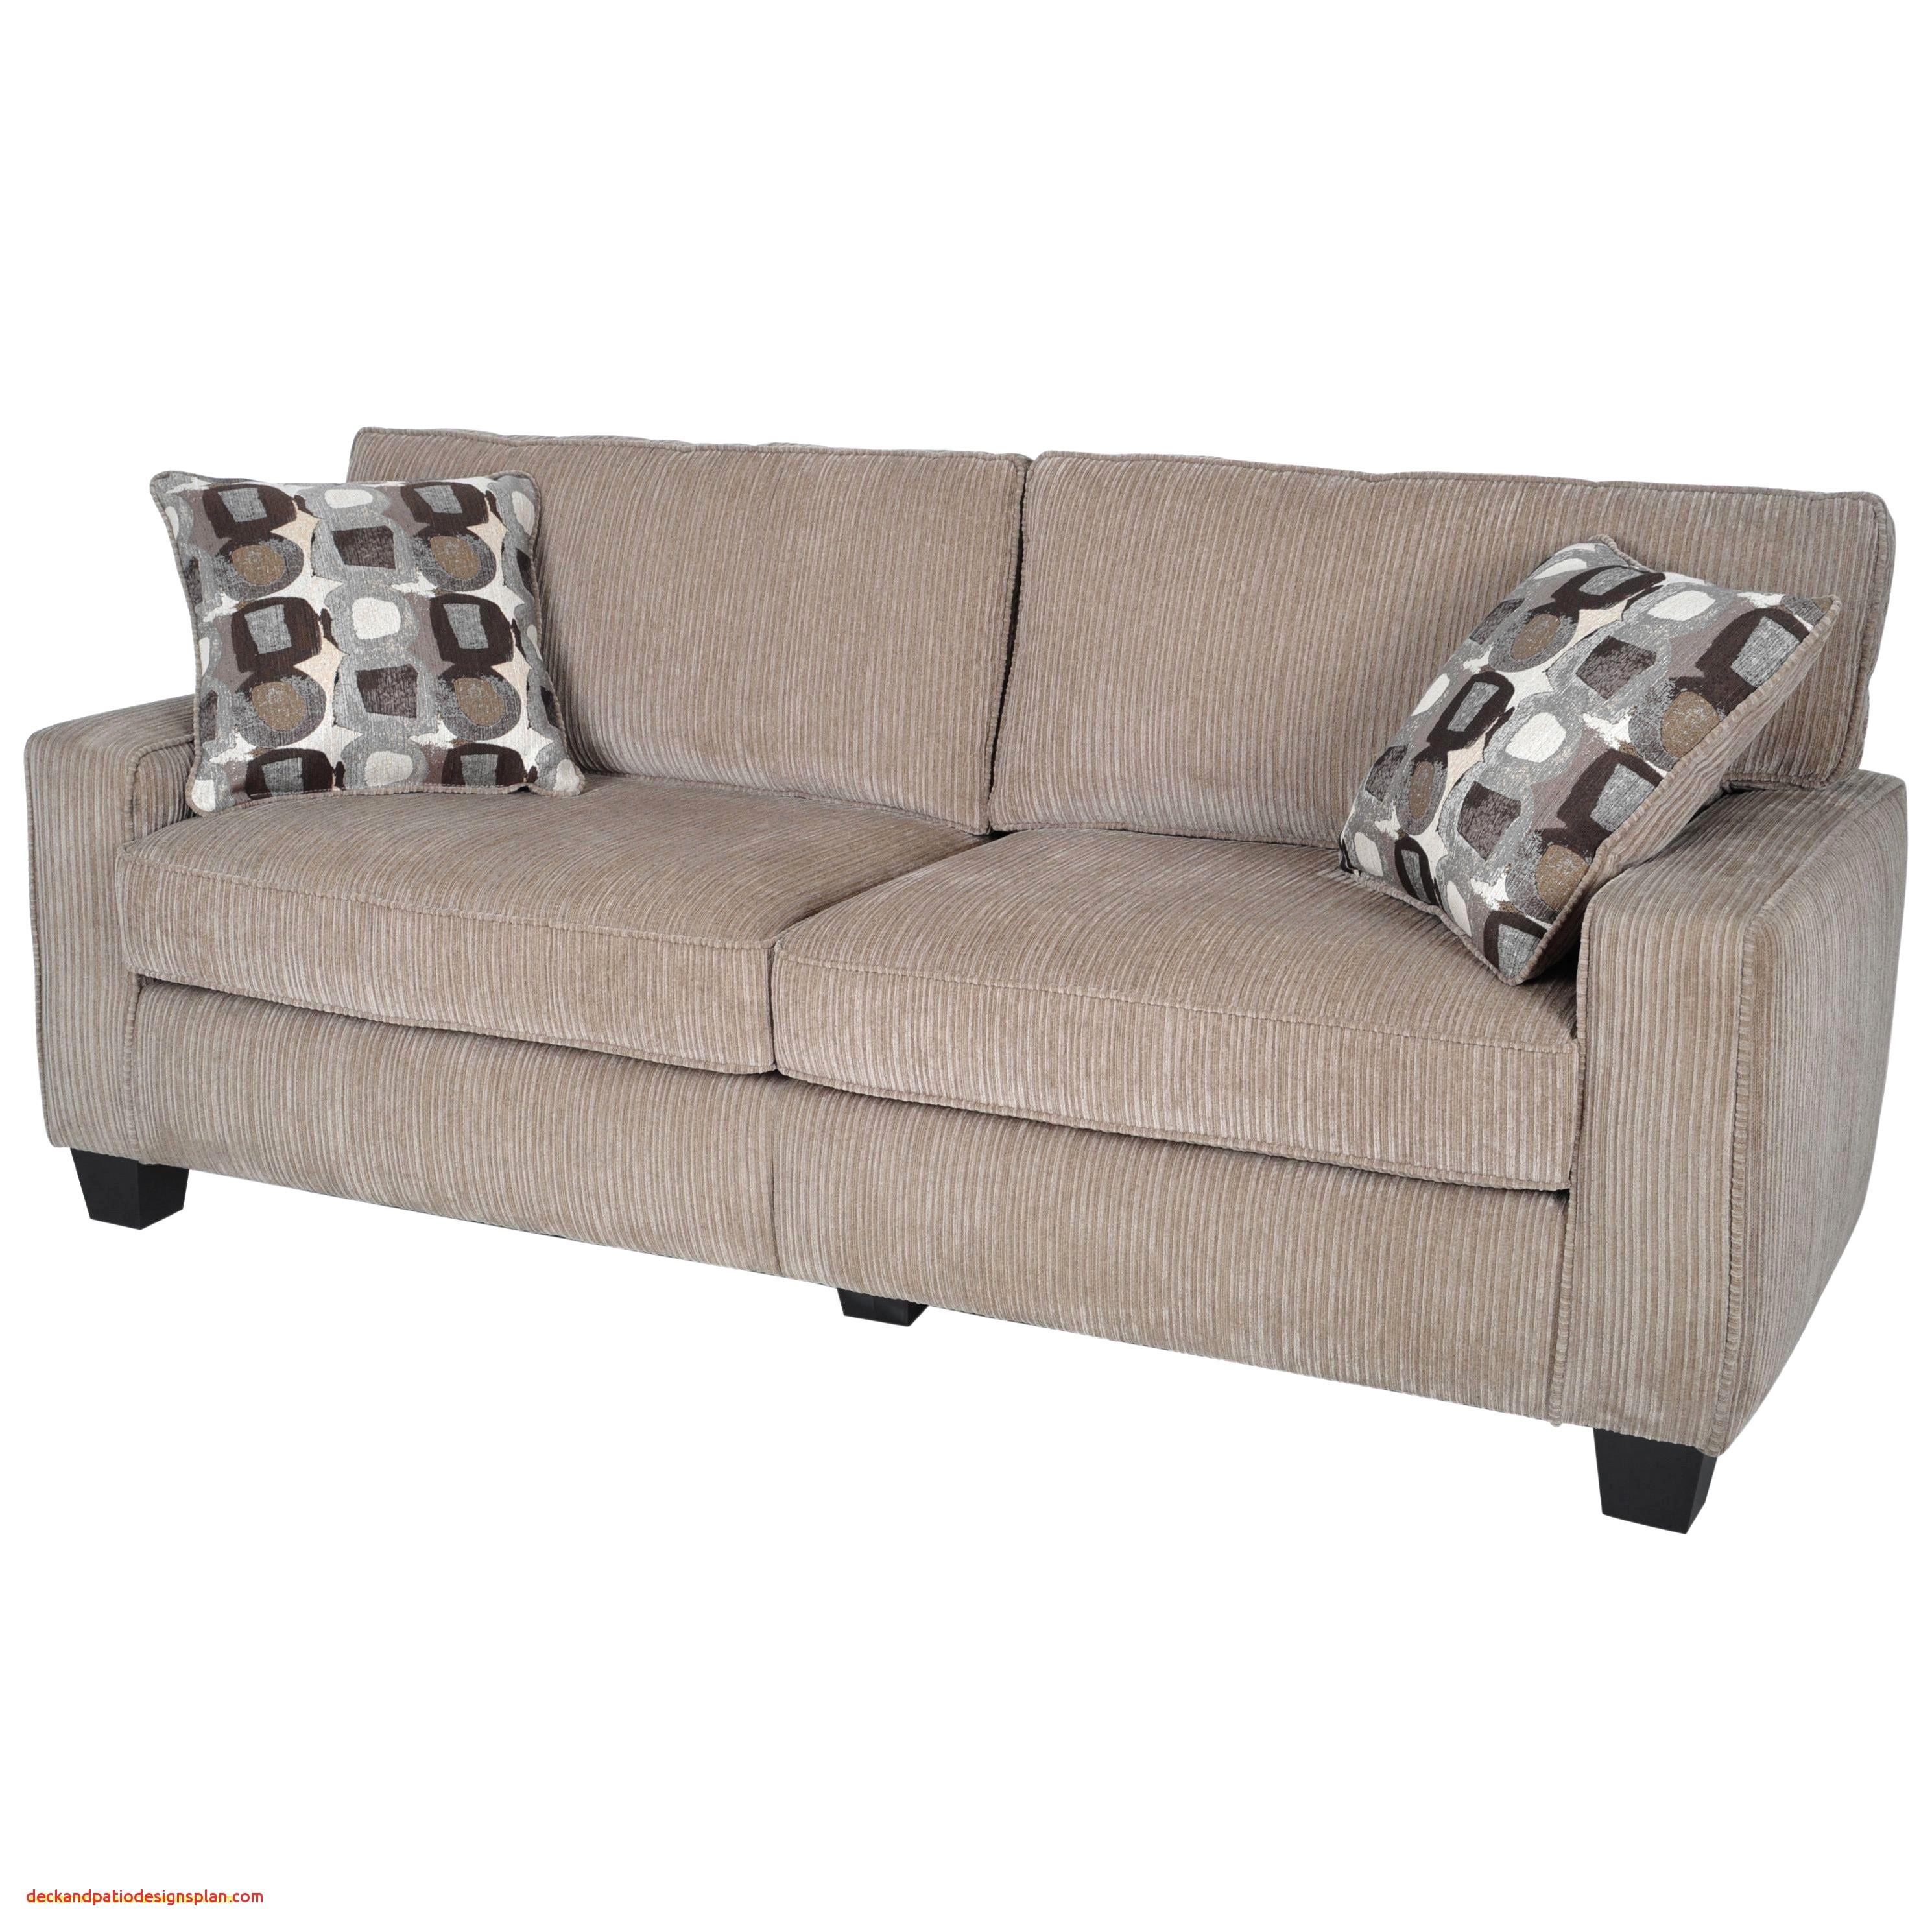 ektorp 2er schlafsofa bezug inspirierend 50 new ikea karlstad sofa cover graphics 50 s galerie